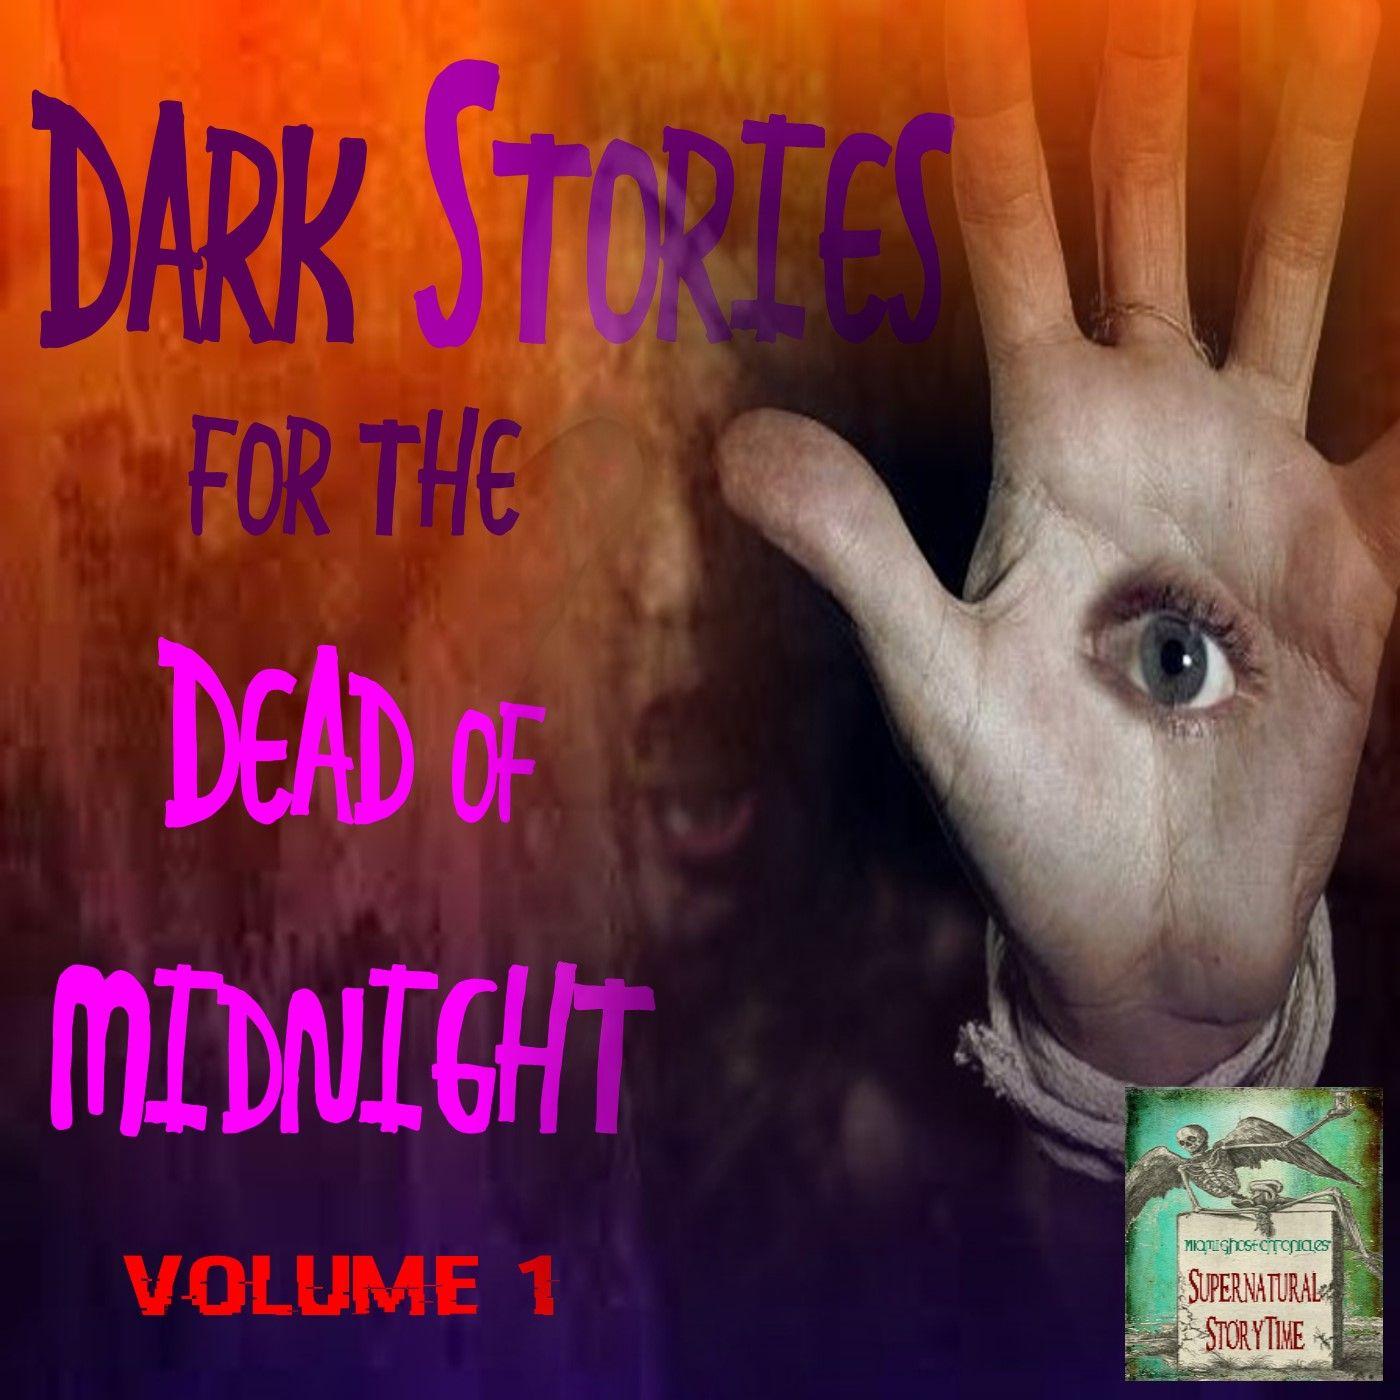 Dark Stories for the Dead of Night | Volume 1 | Podcast E142